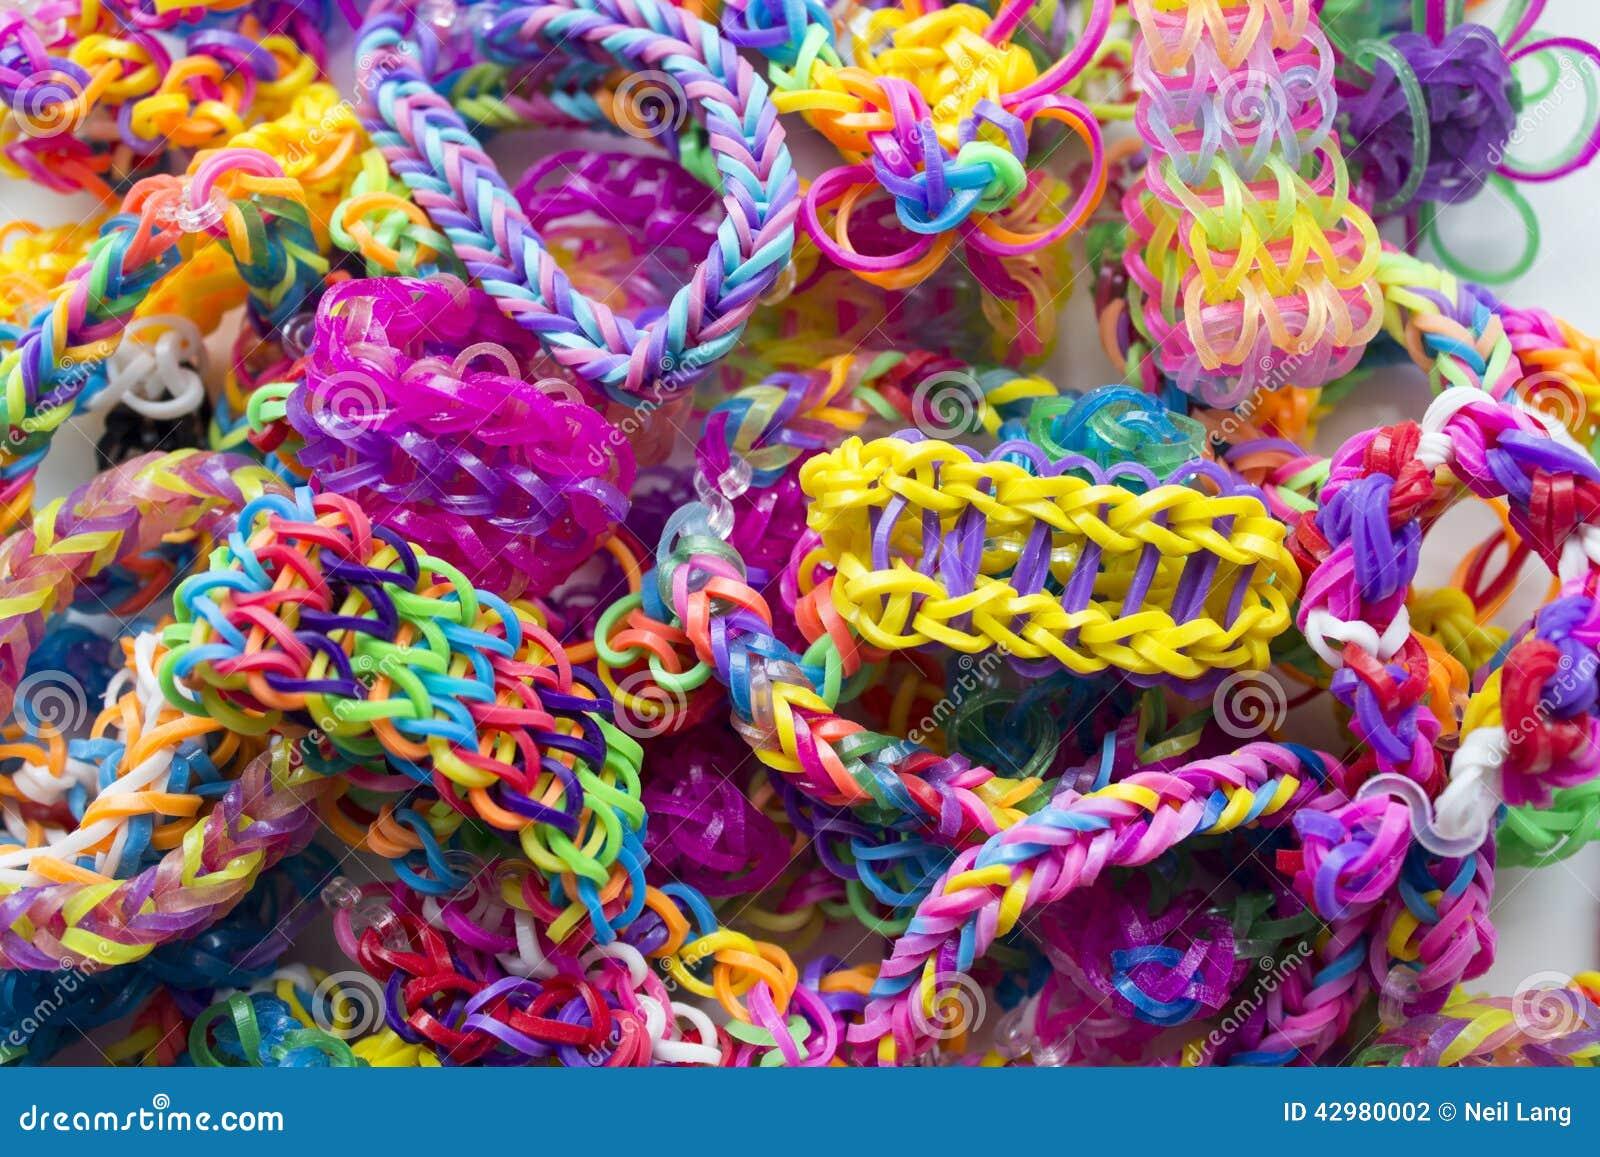 Background Band Bracelets Bright Close Rubber